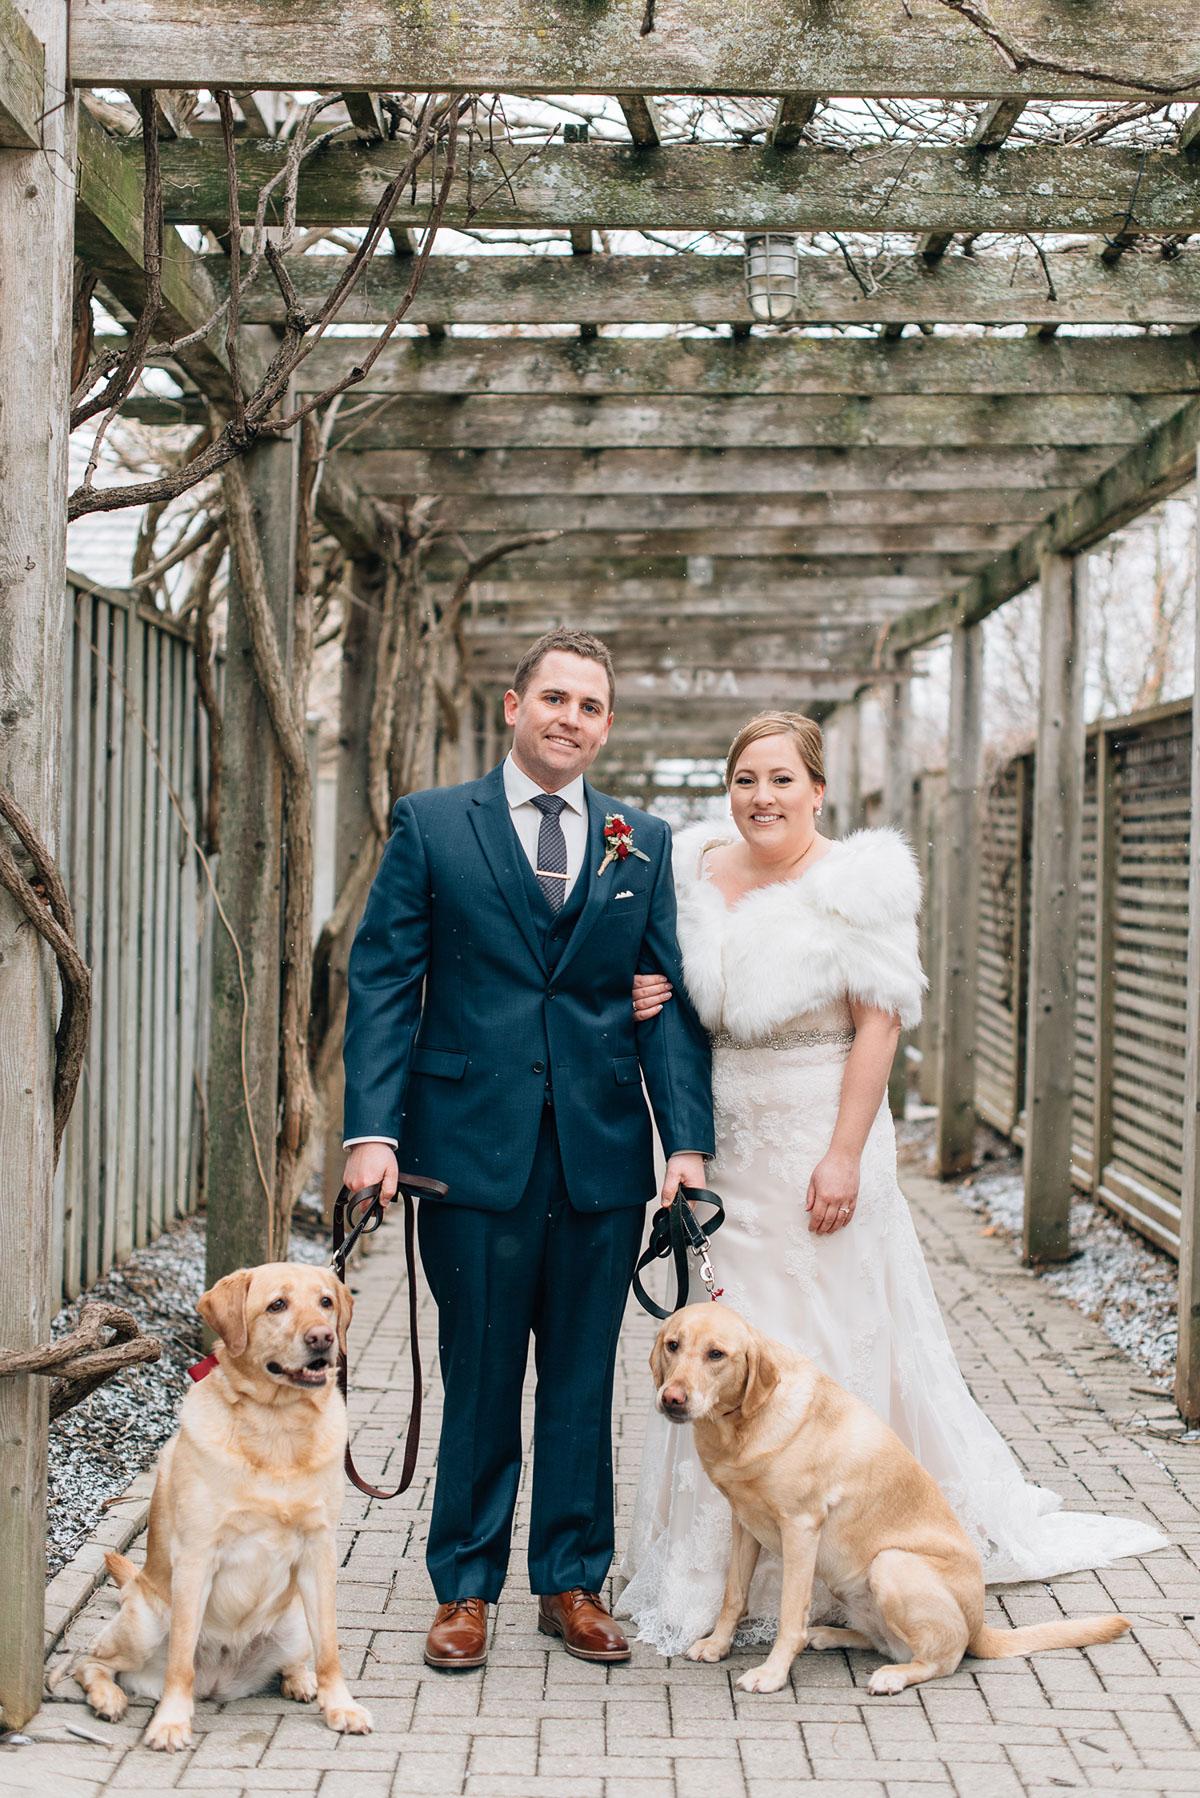 sara-wilde-photography-vineyard-bride-swish-list-inn-on-the-twenty-jordan-wedding-36.jpg